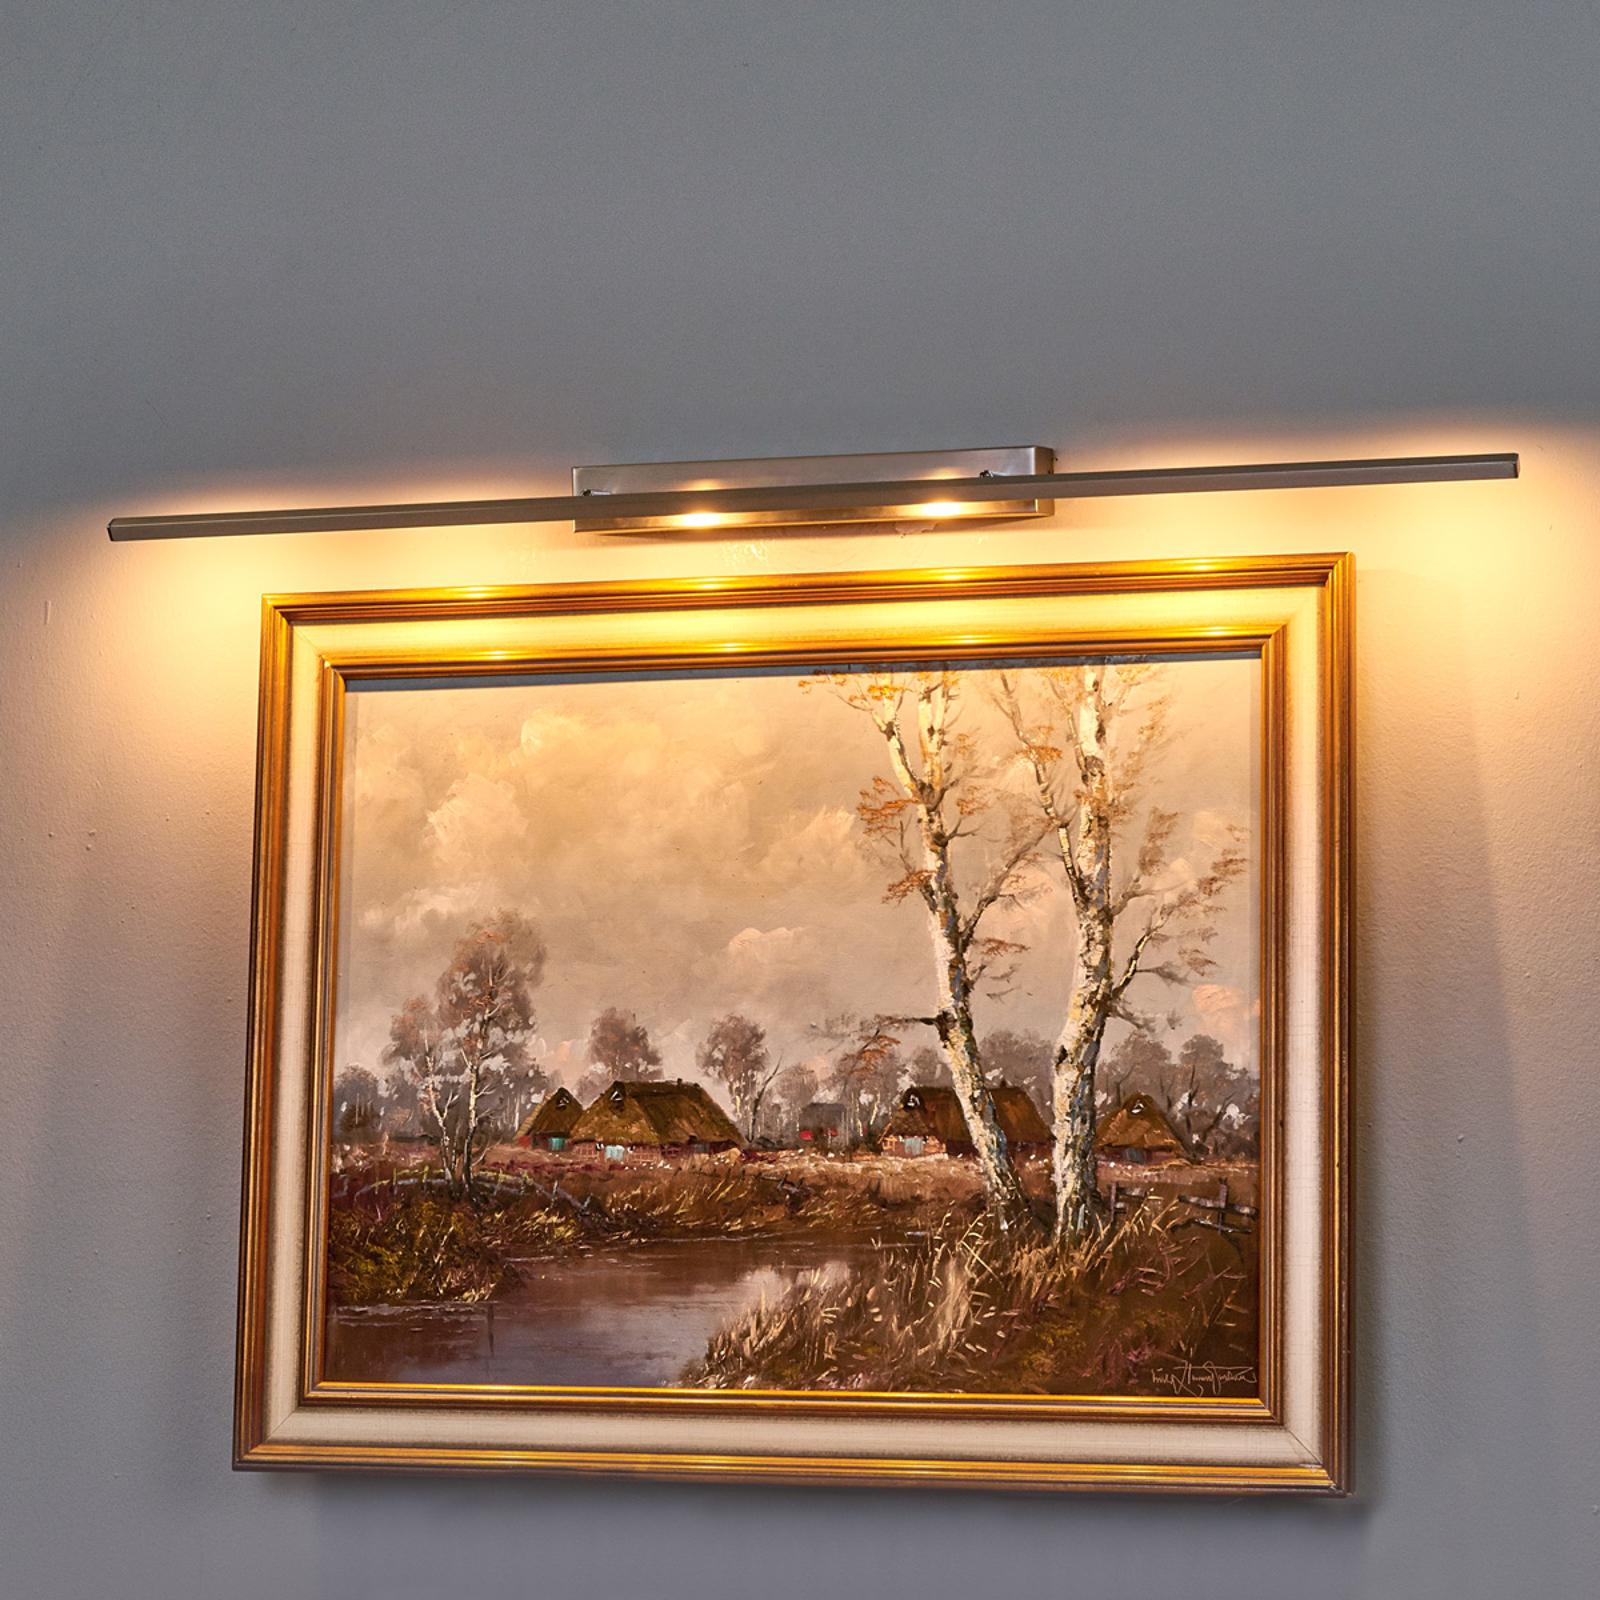 Belle applique tableau LED Tolu -made in Germany